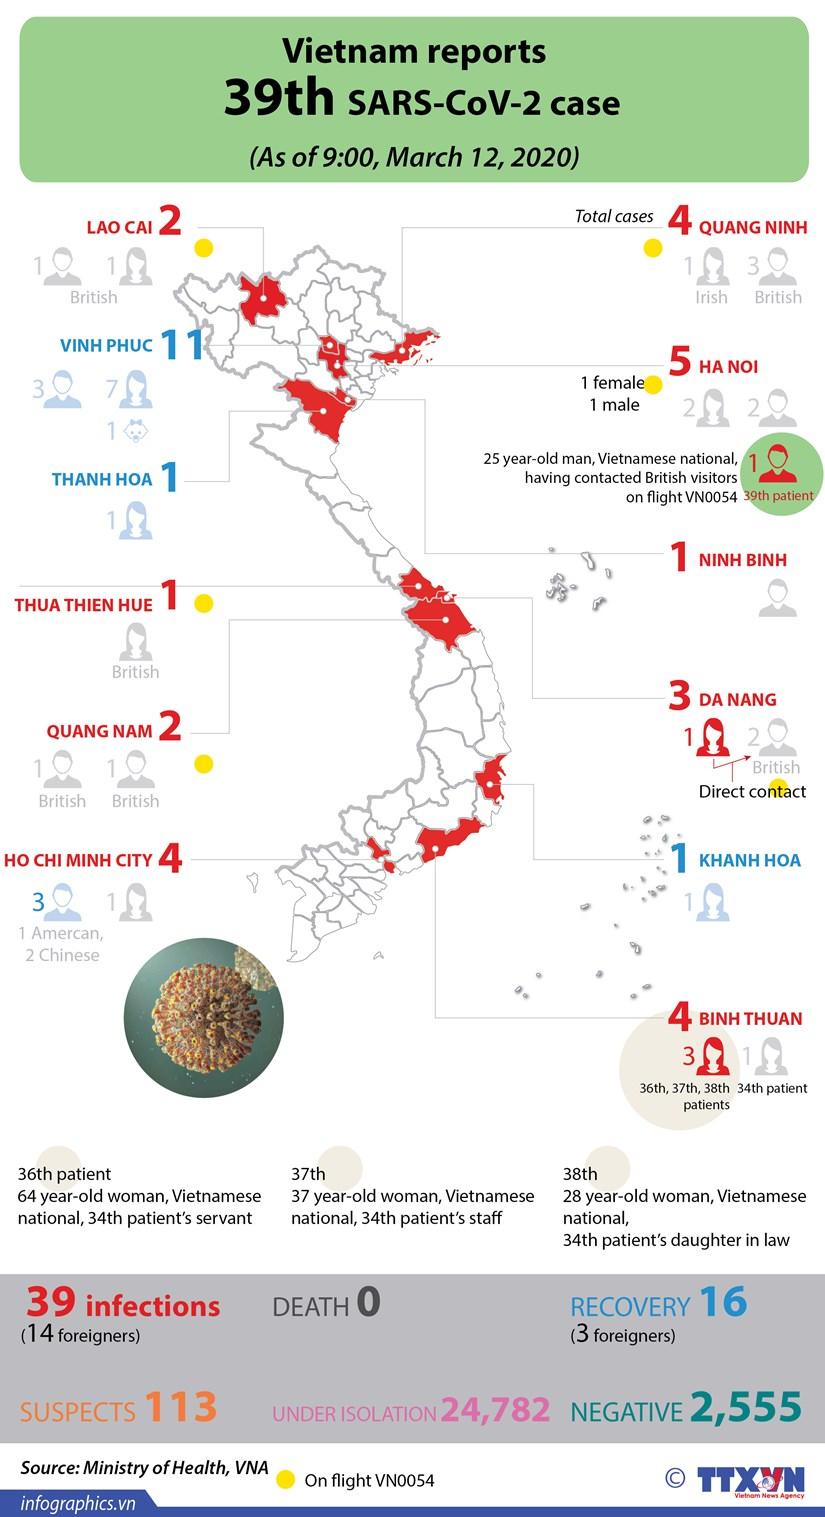 Vietnam reports 39th SARS-CoV-2 case hinh anh 1